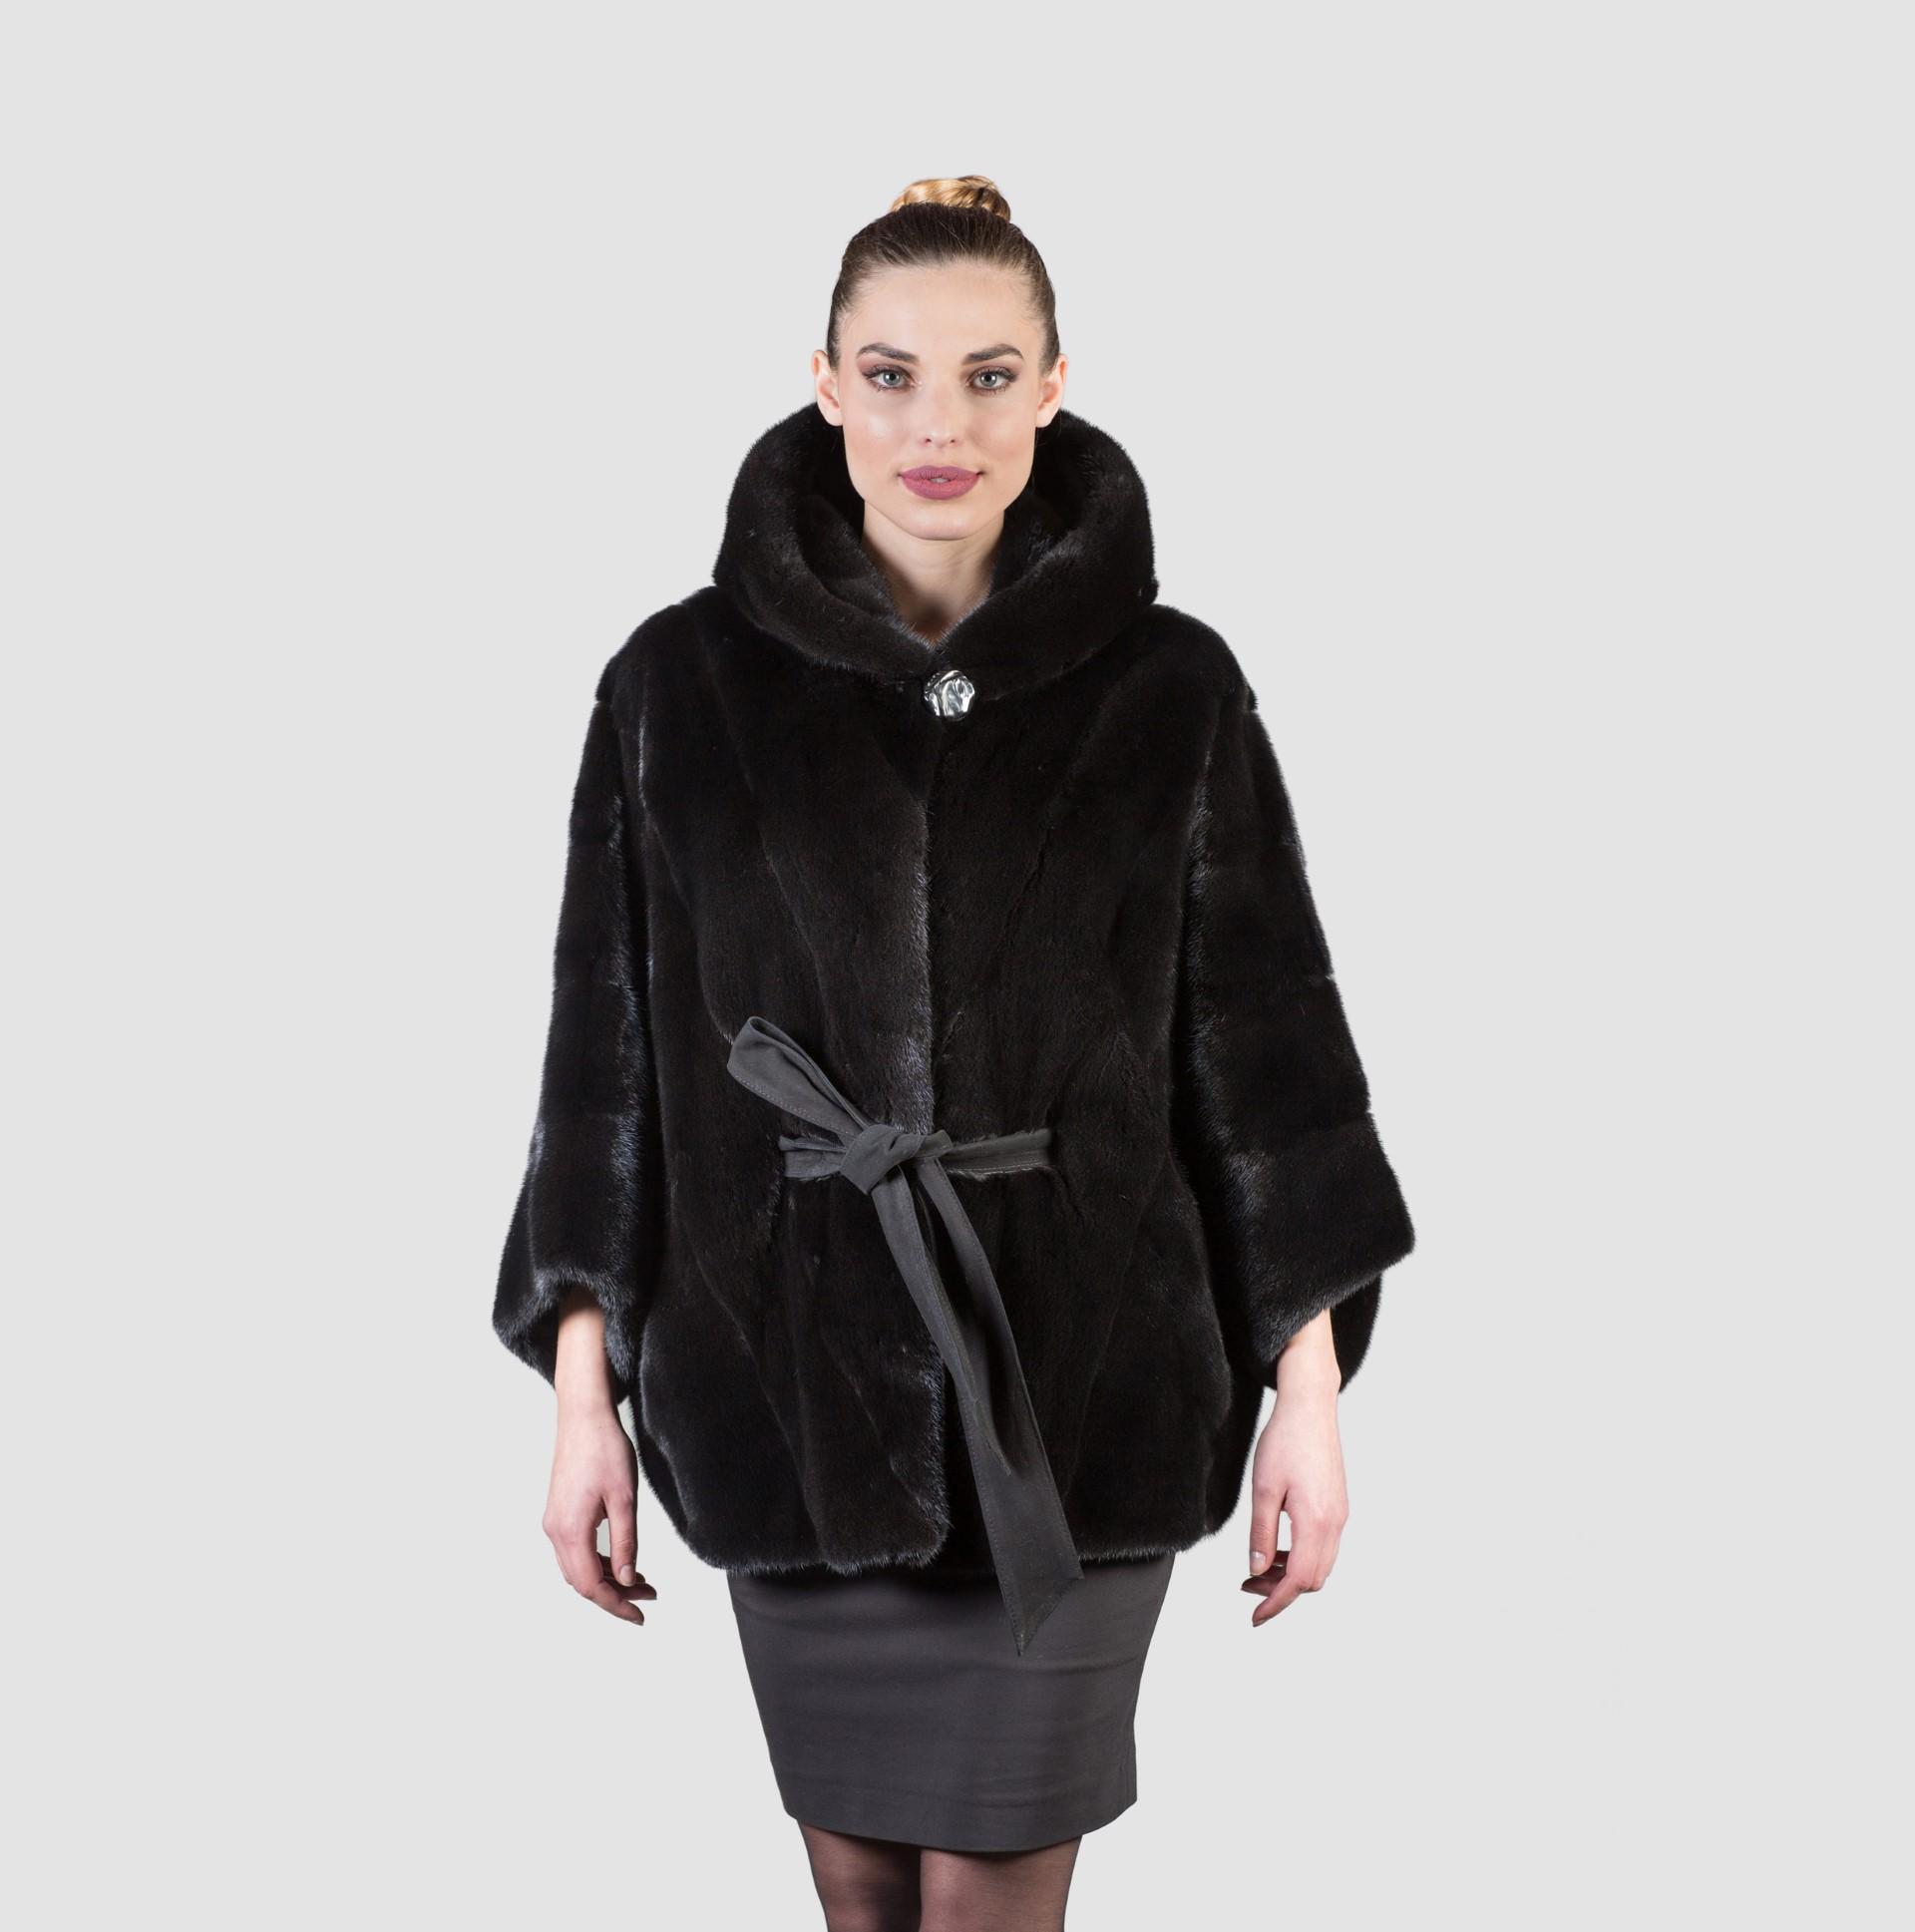 Black Mink Fur Jacket With Hood - 100% Real Fur Coats - Haute Acorn